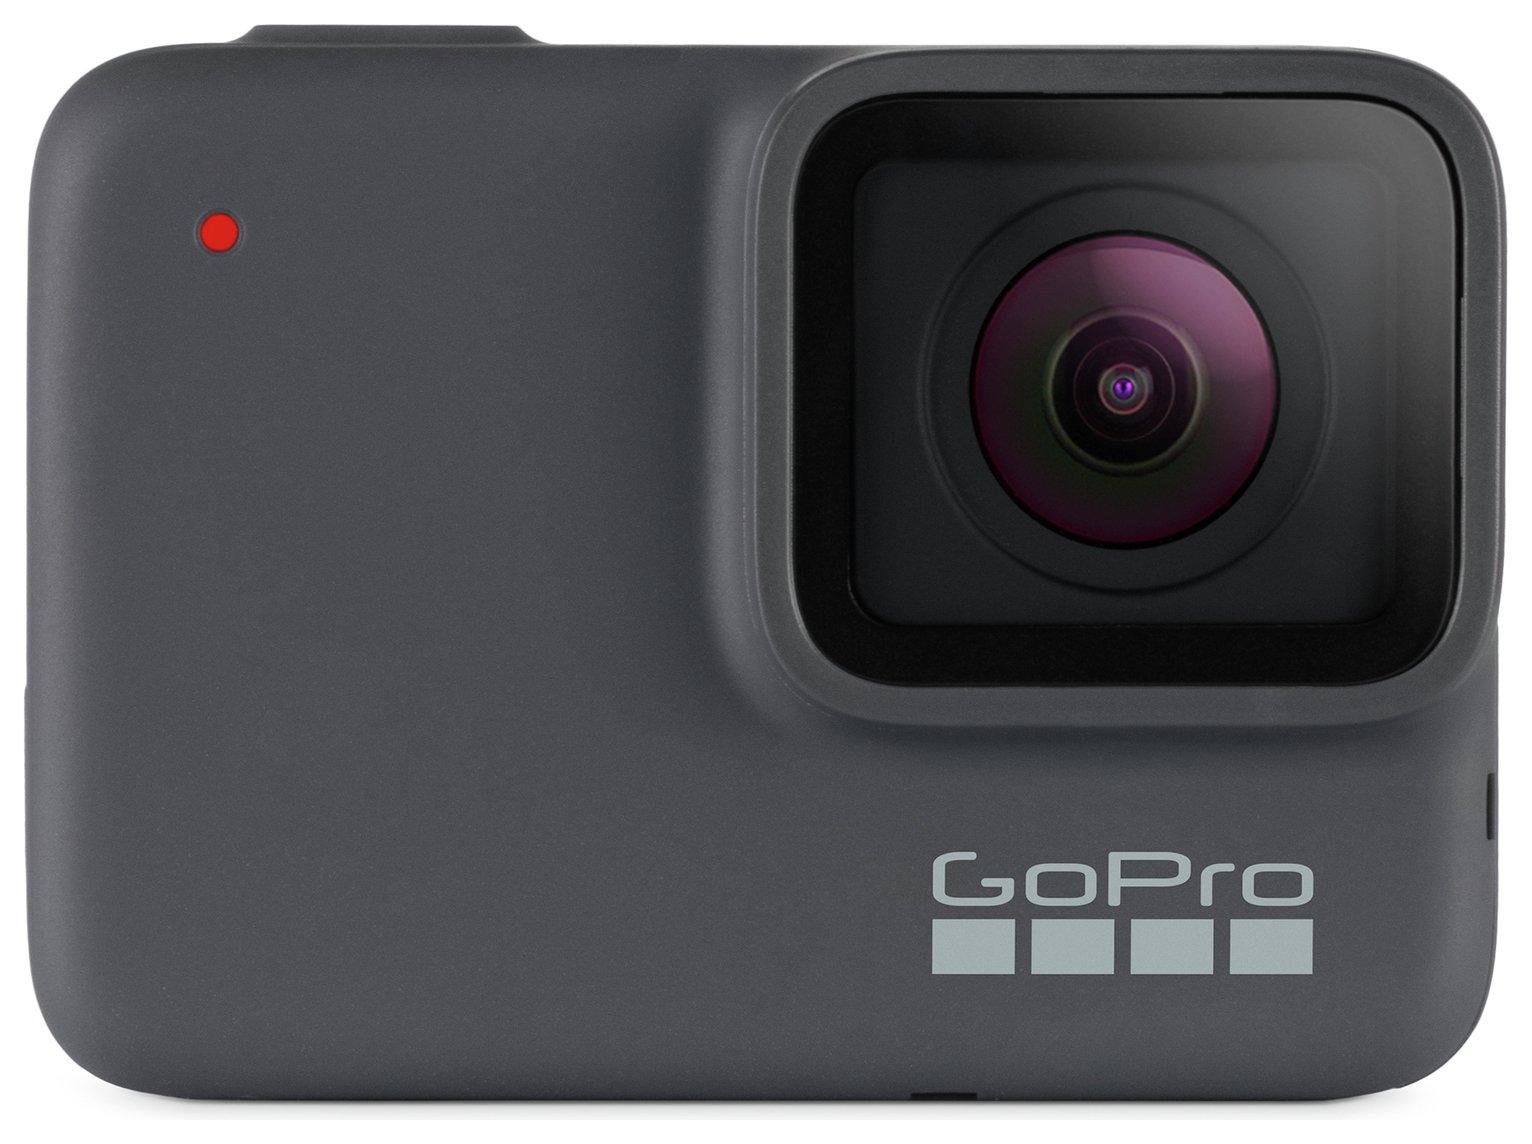 GoPro HERO7 Silver CHDHC-601-RW Action Camera